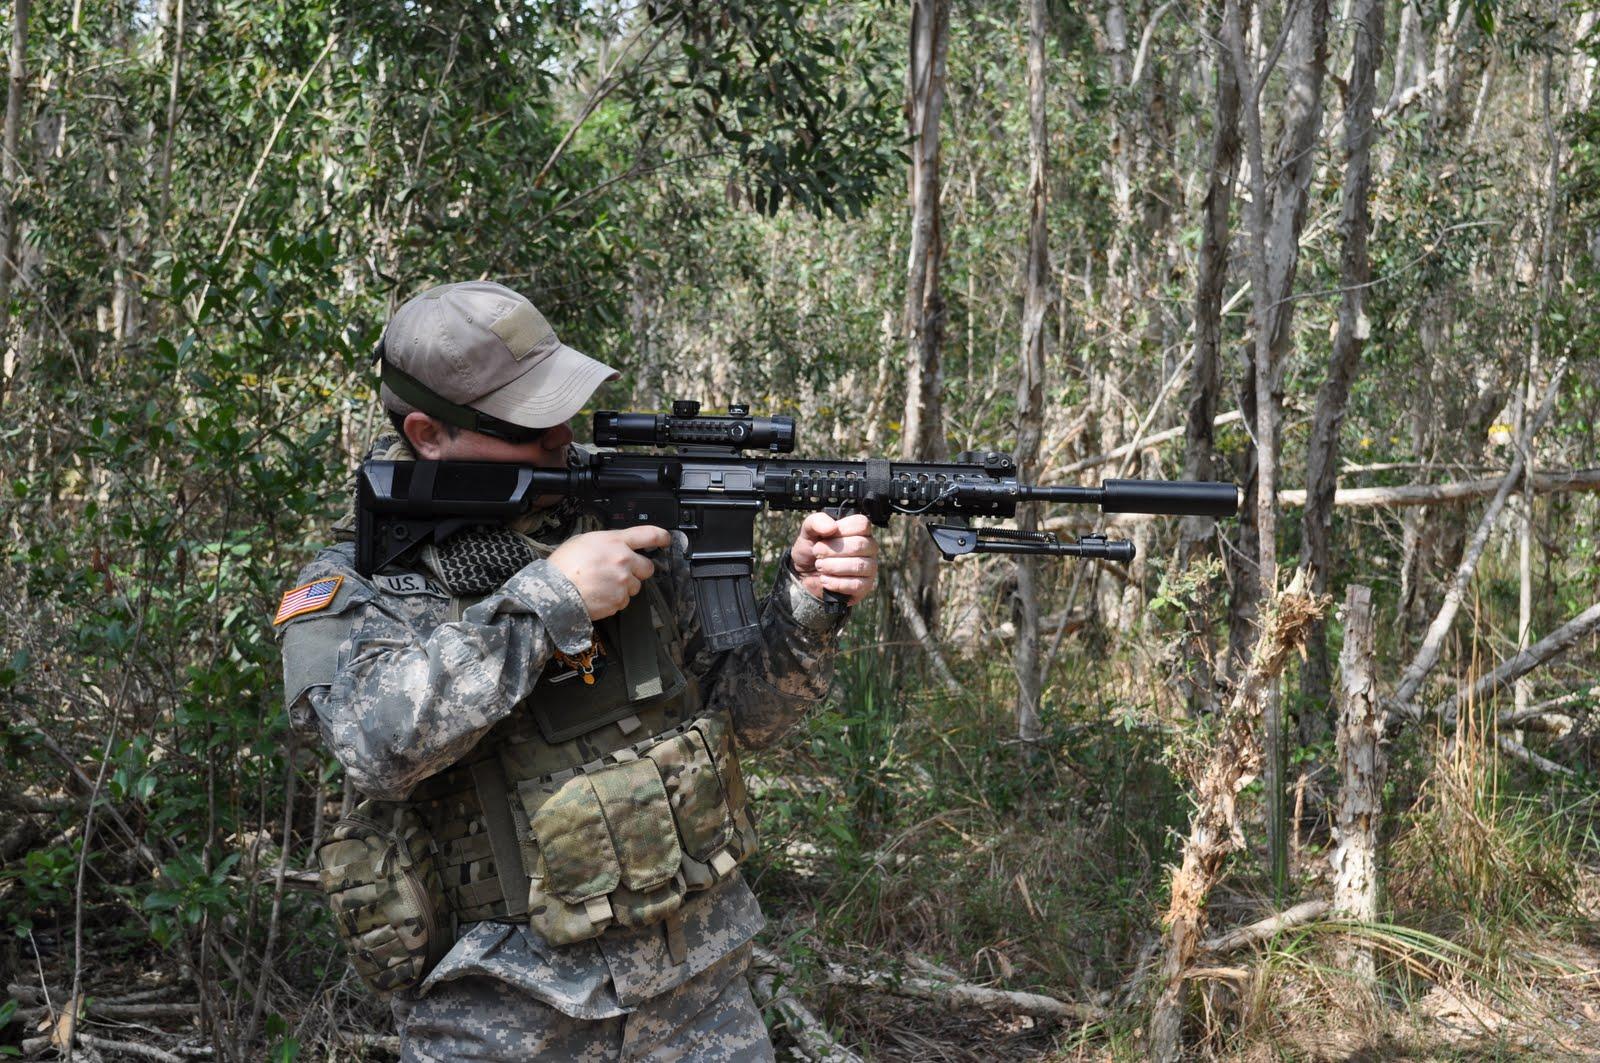 custom airsoft sniper rifles airsoft sniper loadout airsoft sniper    Airsoft Sniper Team